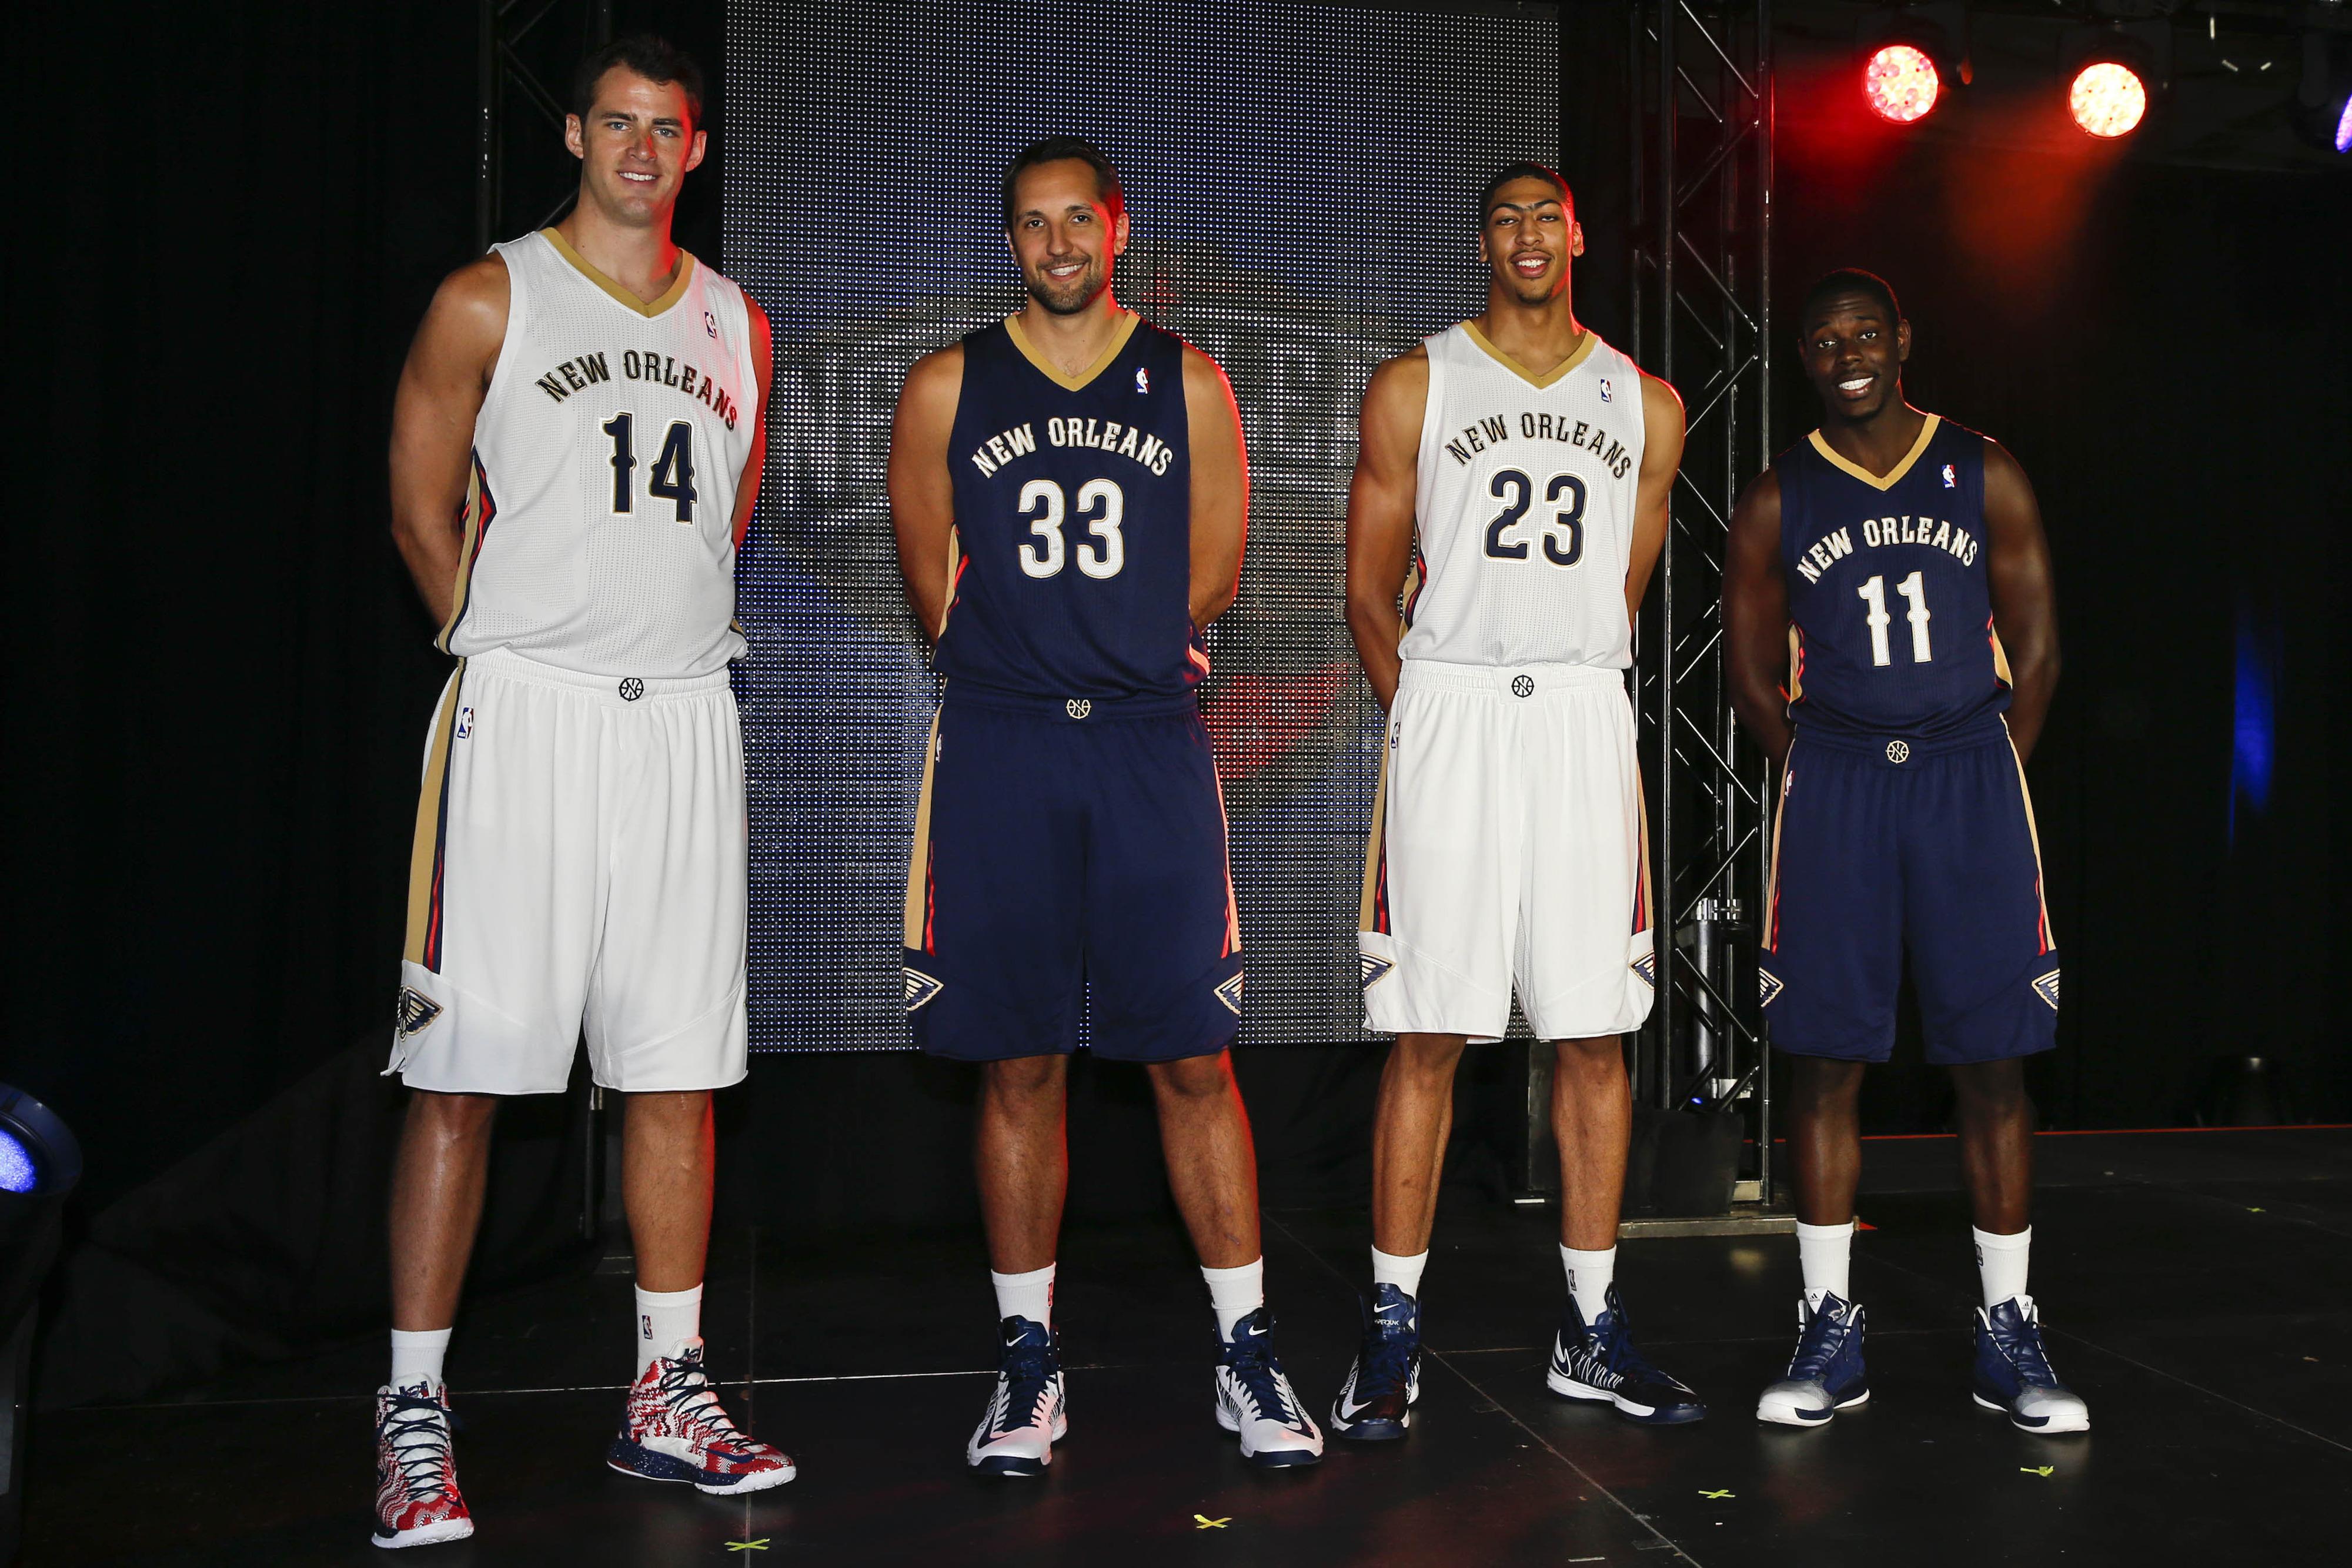 Who has the best uniform?